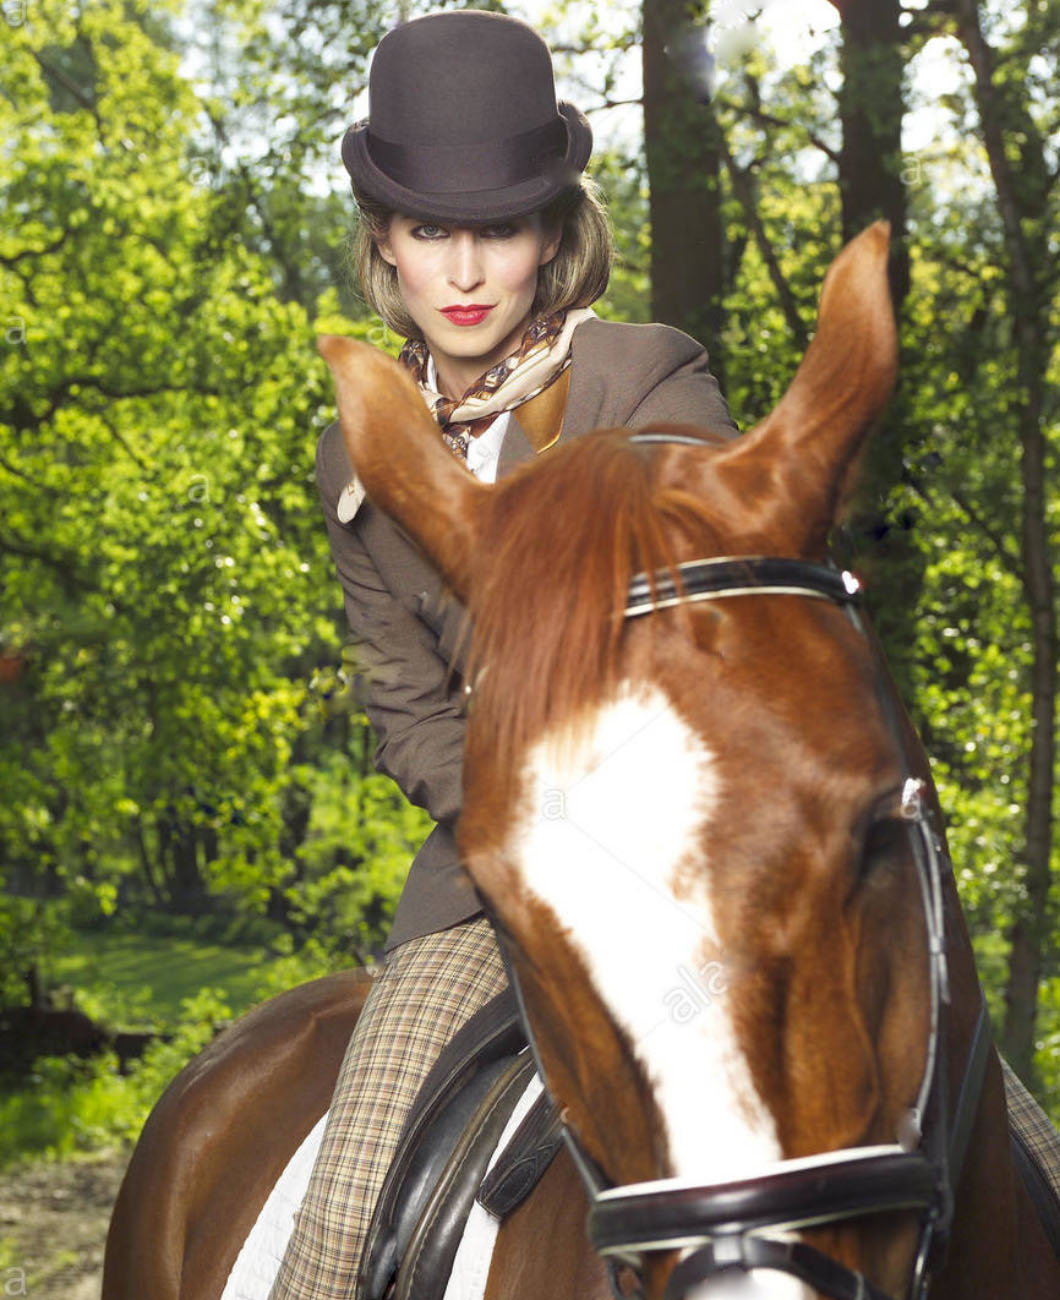 neckerchief-necktie-shirt-elegant-outfit-carolina-herrara-la-polo-lapolo-horse-rider